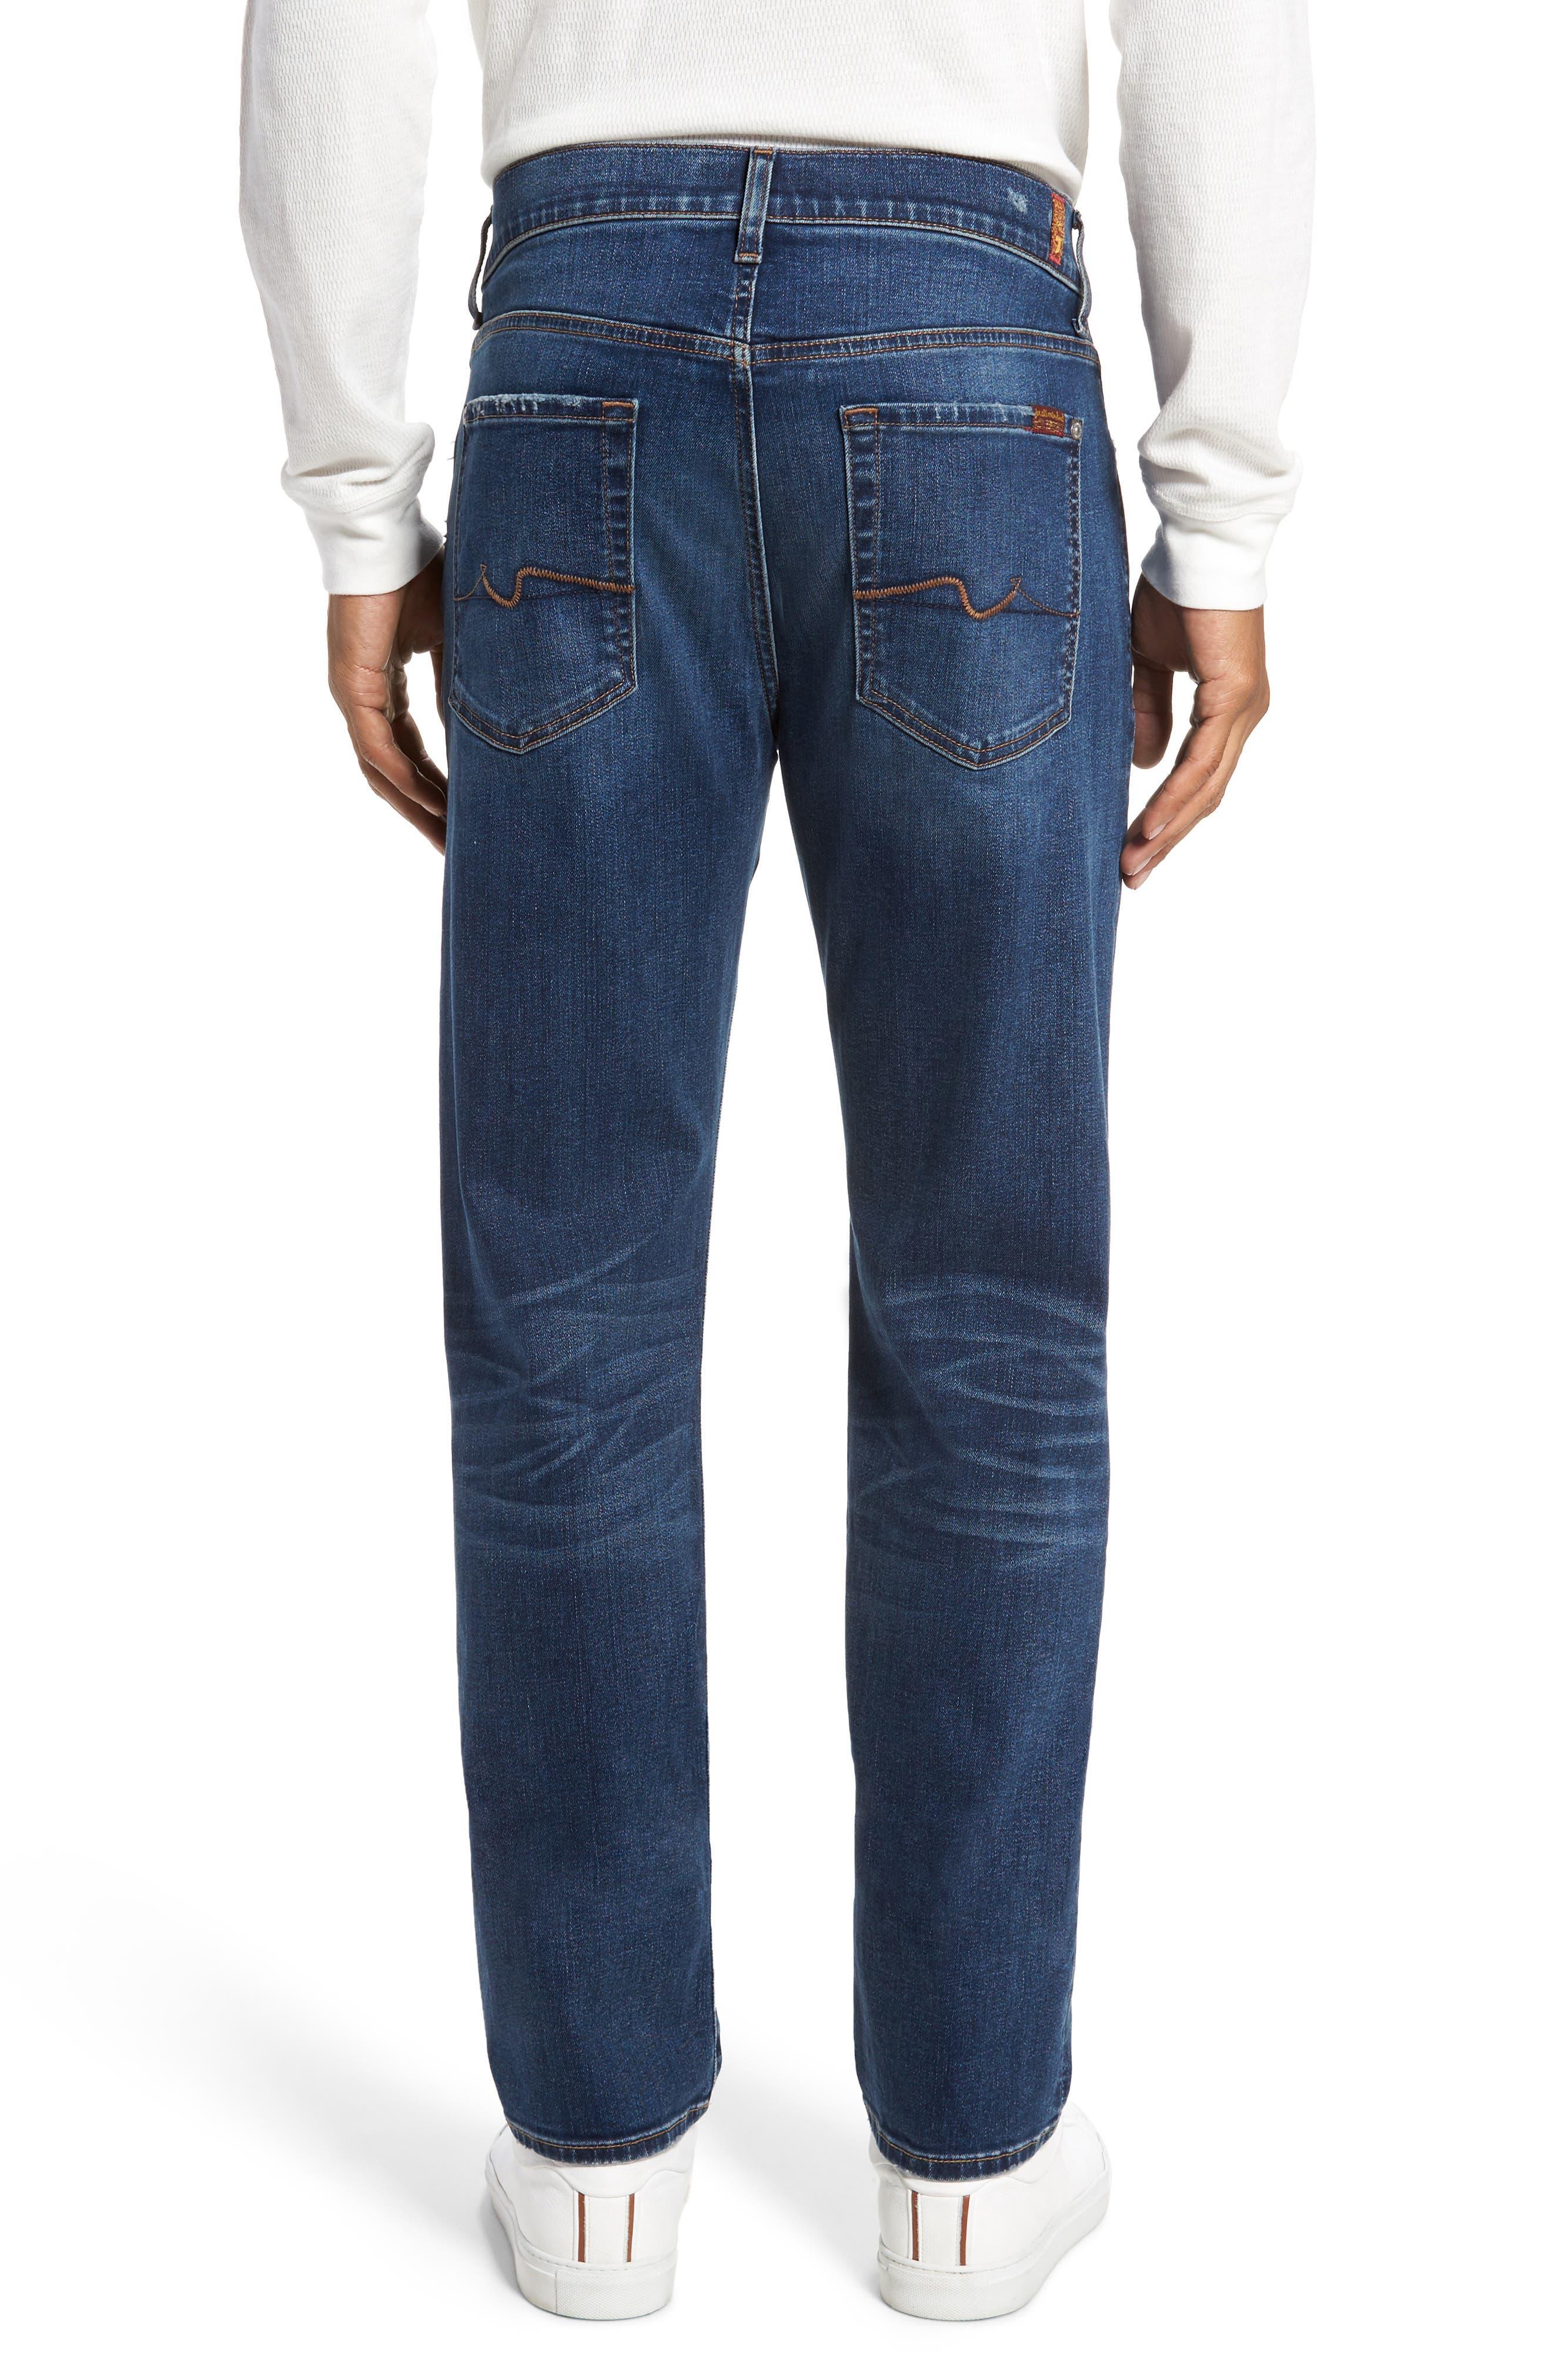 Slimmy Slim Fit Jeans,                             Alternate thumbnail 2, color,                             407